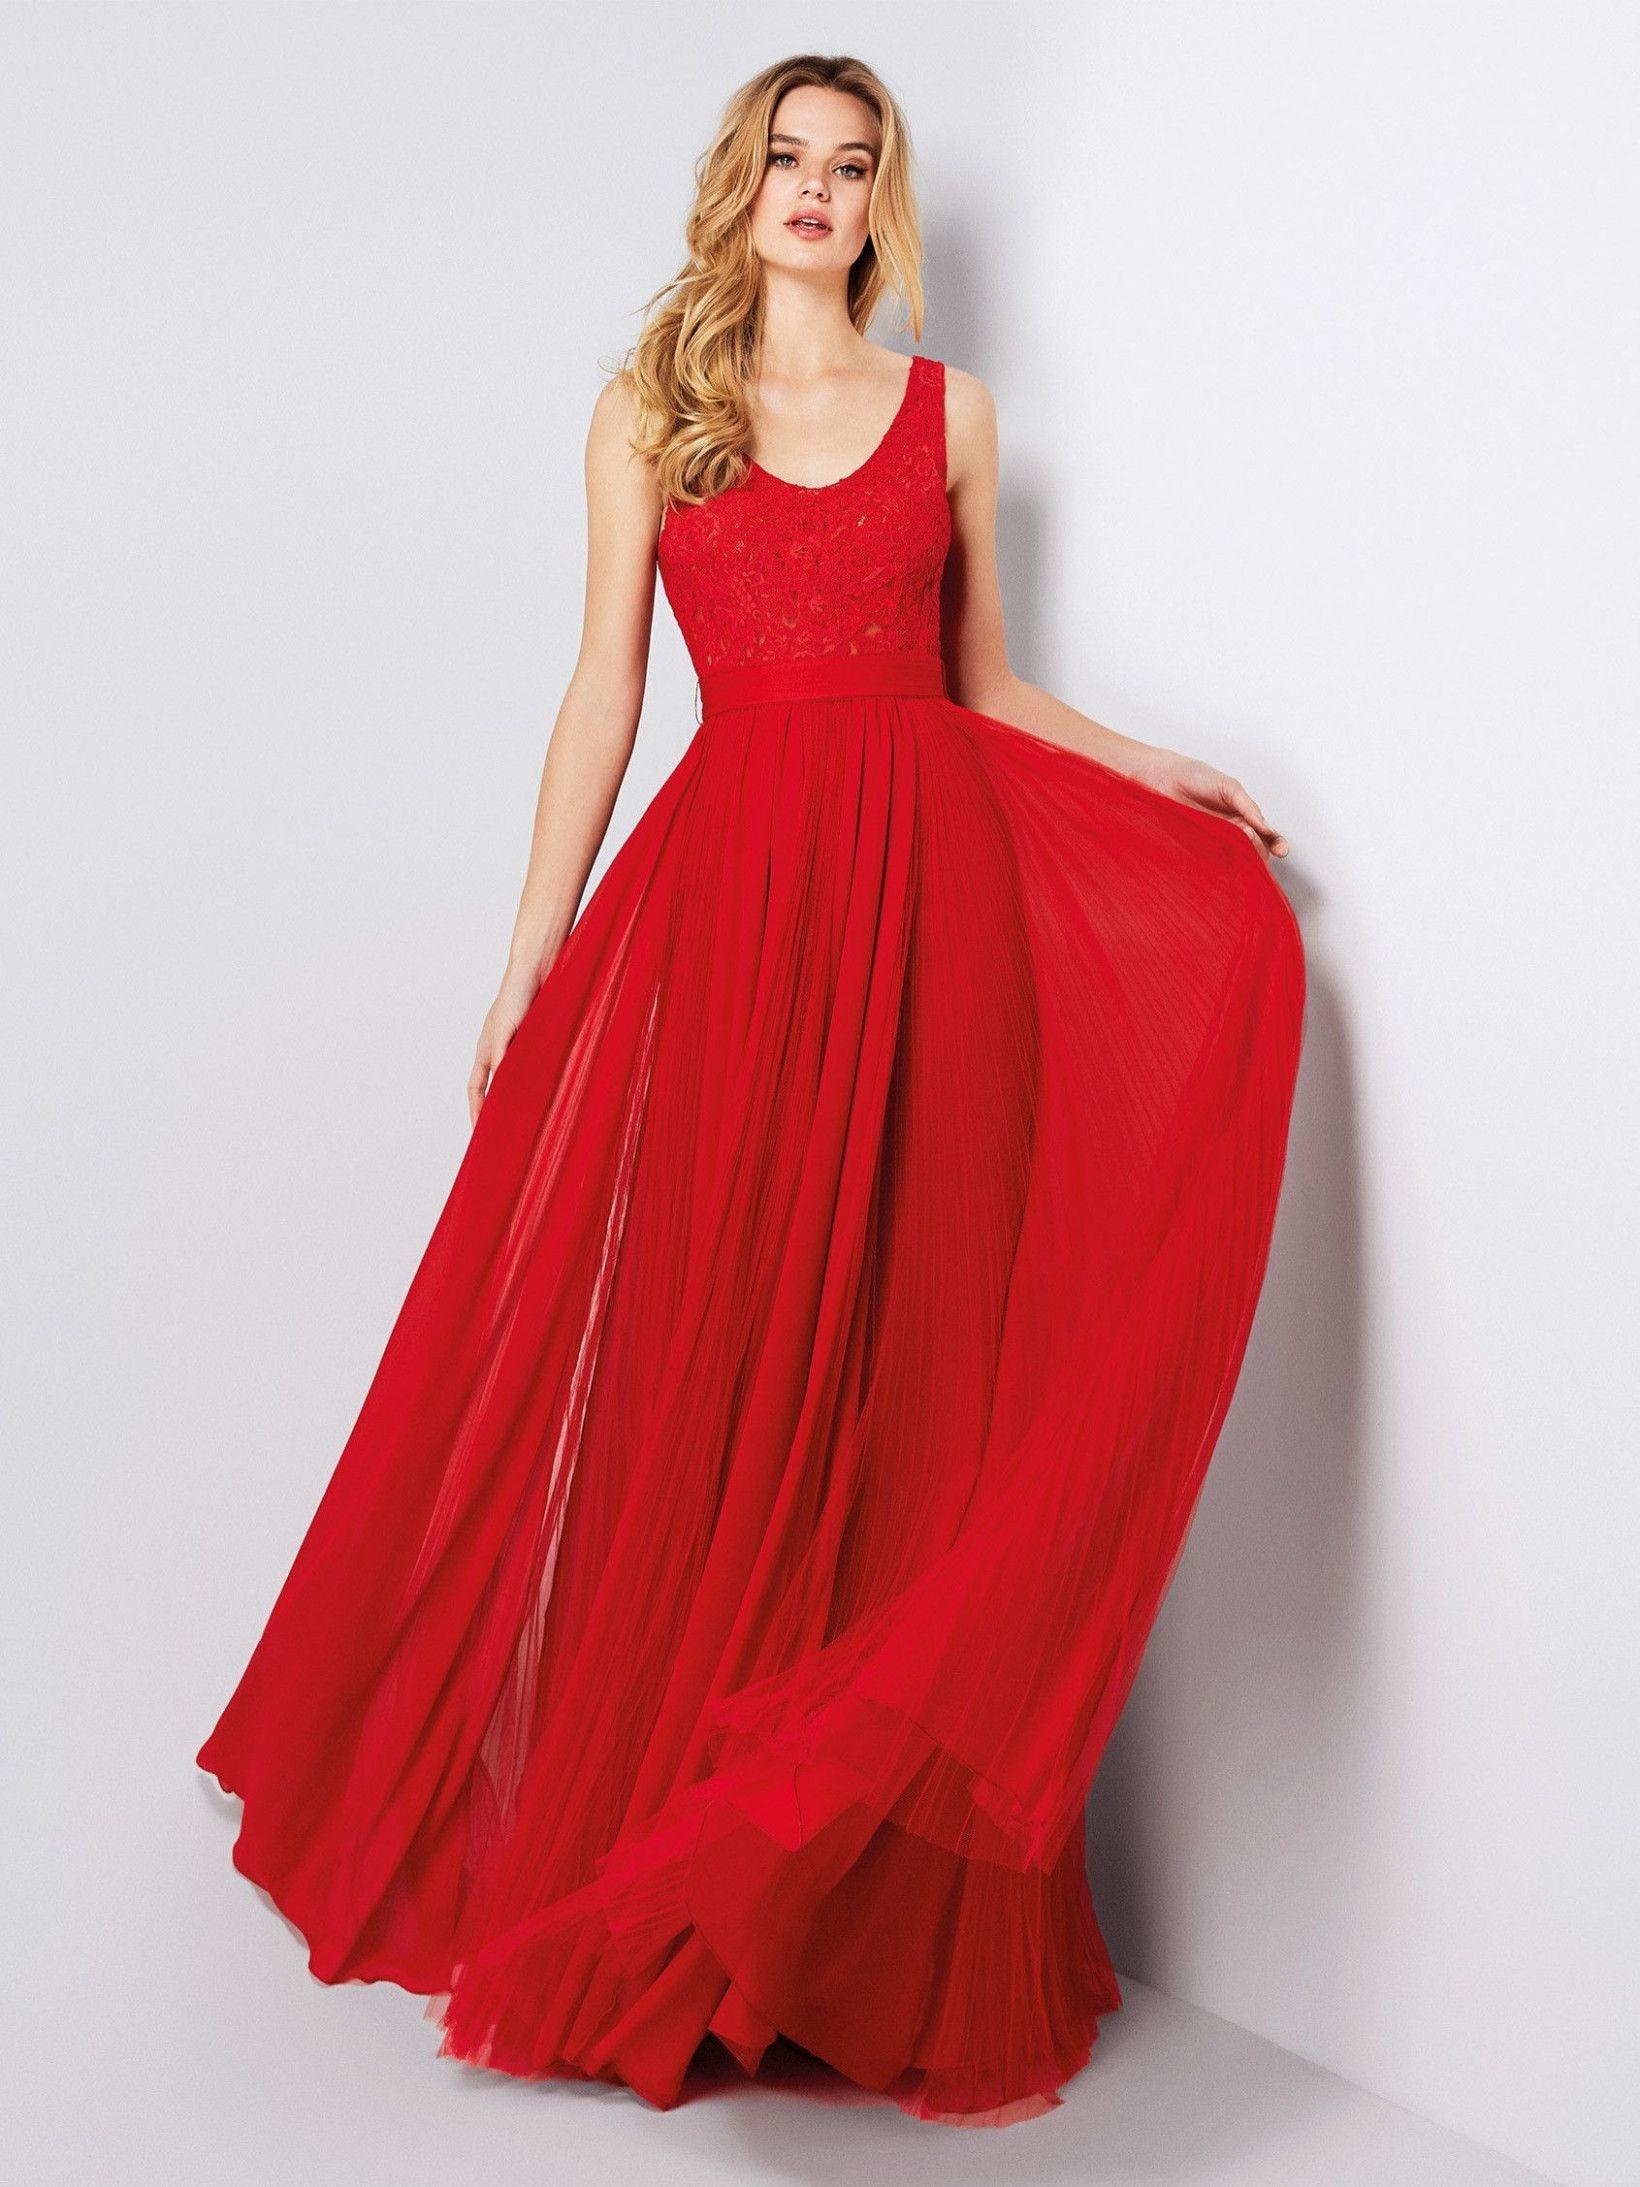 11 Abendkleid Rot Spitze Lang in 11  Abendkleid, Kleid spitze